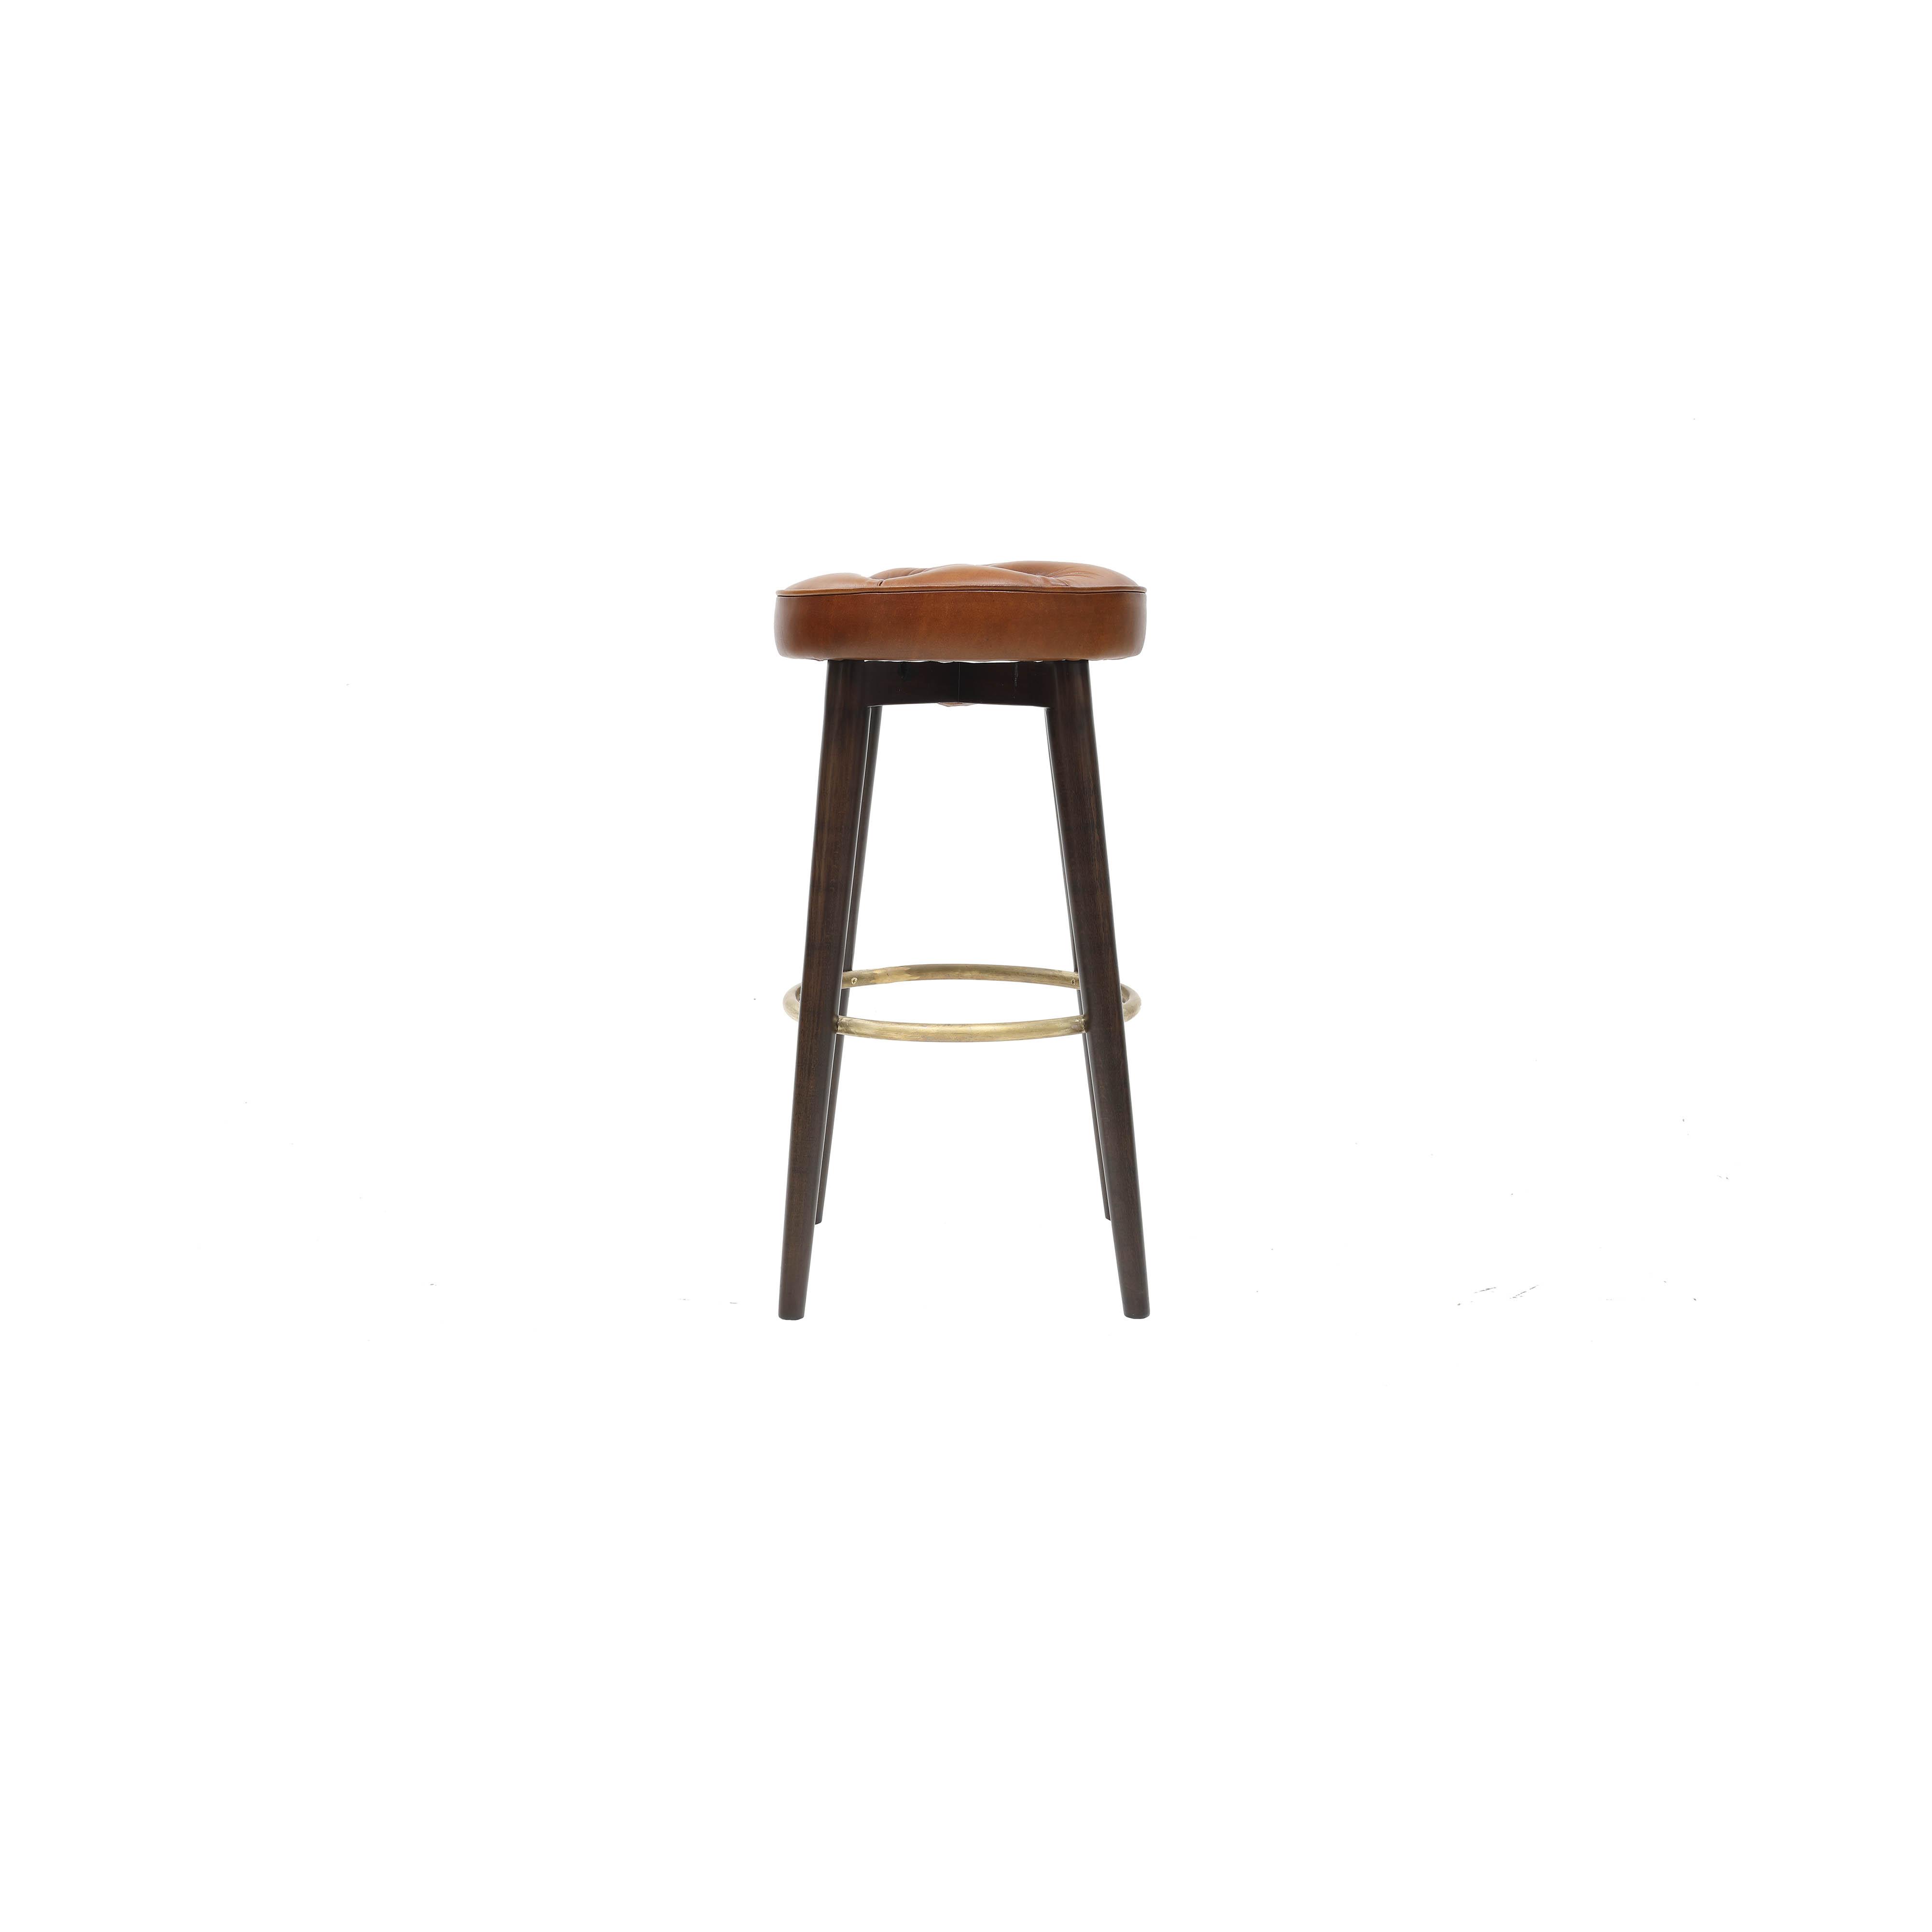 Fritzie bar stool